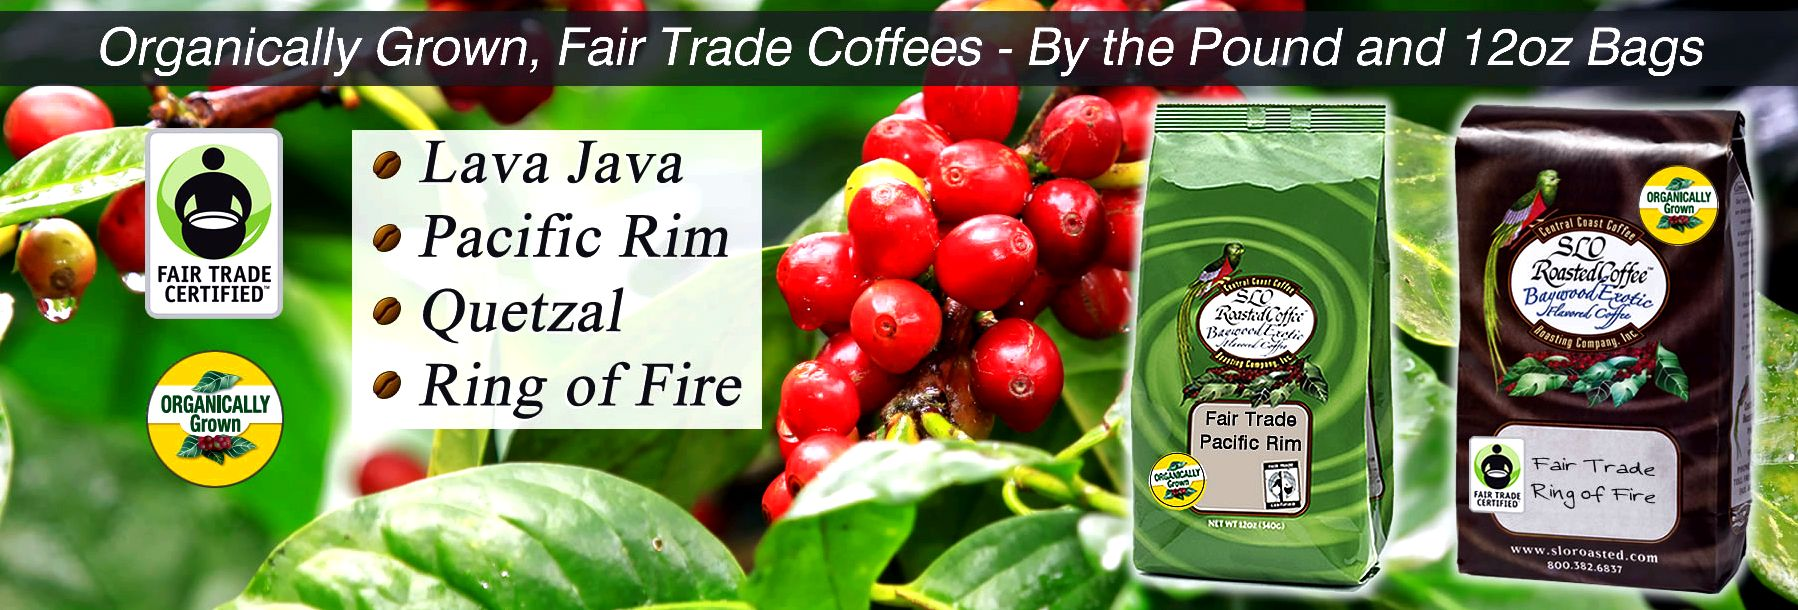 Fair Trade Organically Grown - display:none